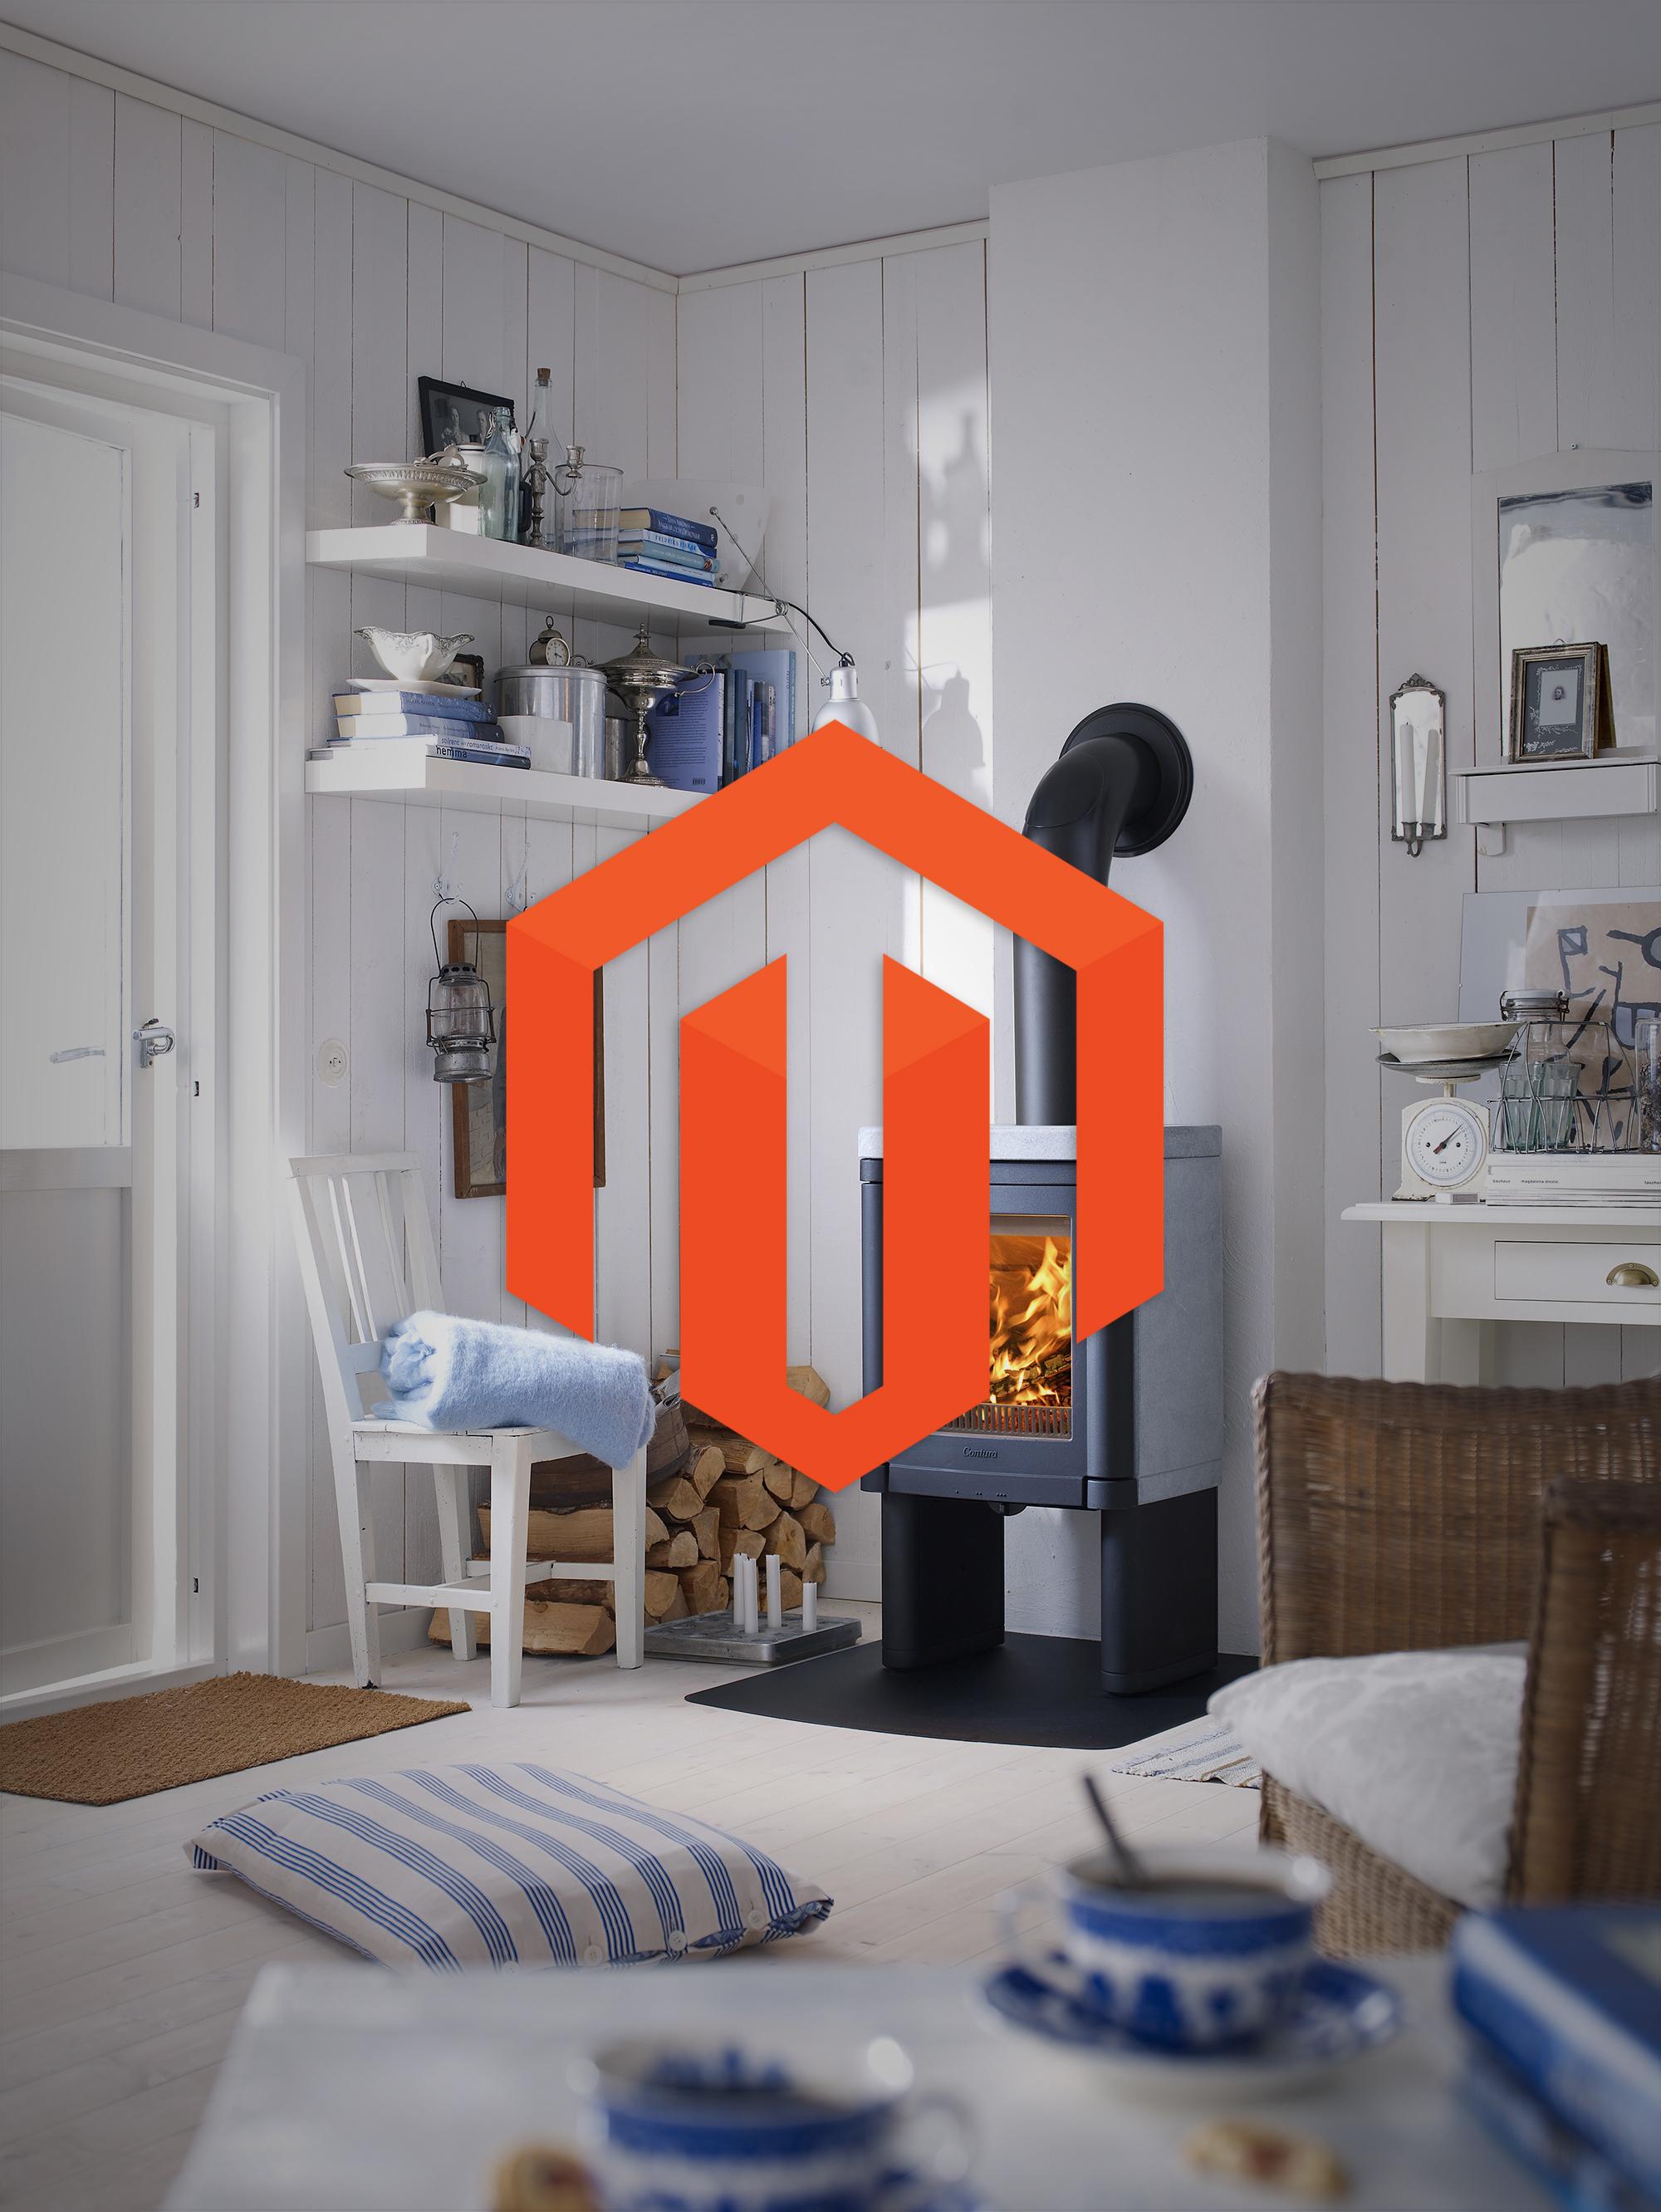 spartherm varia a fdh 4s spartherm kassetter. Black Bedroom Furniture Sets. Home Design Ideas